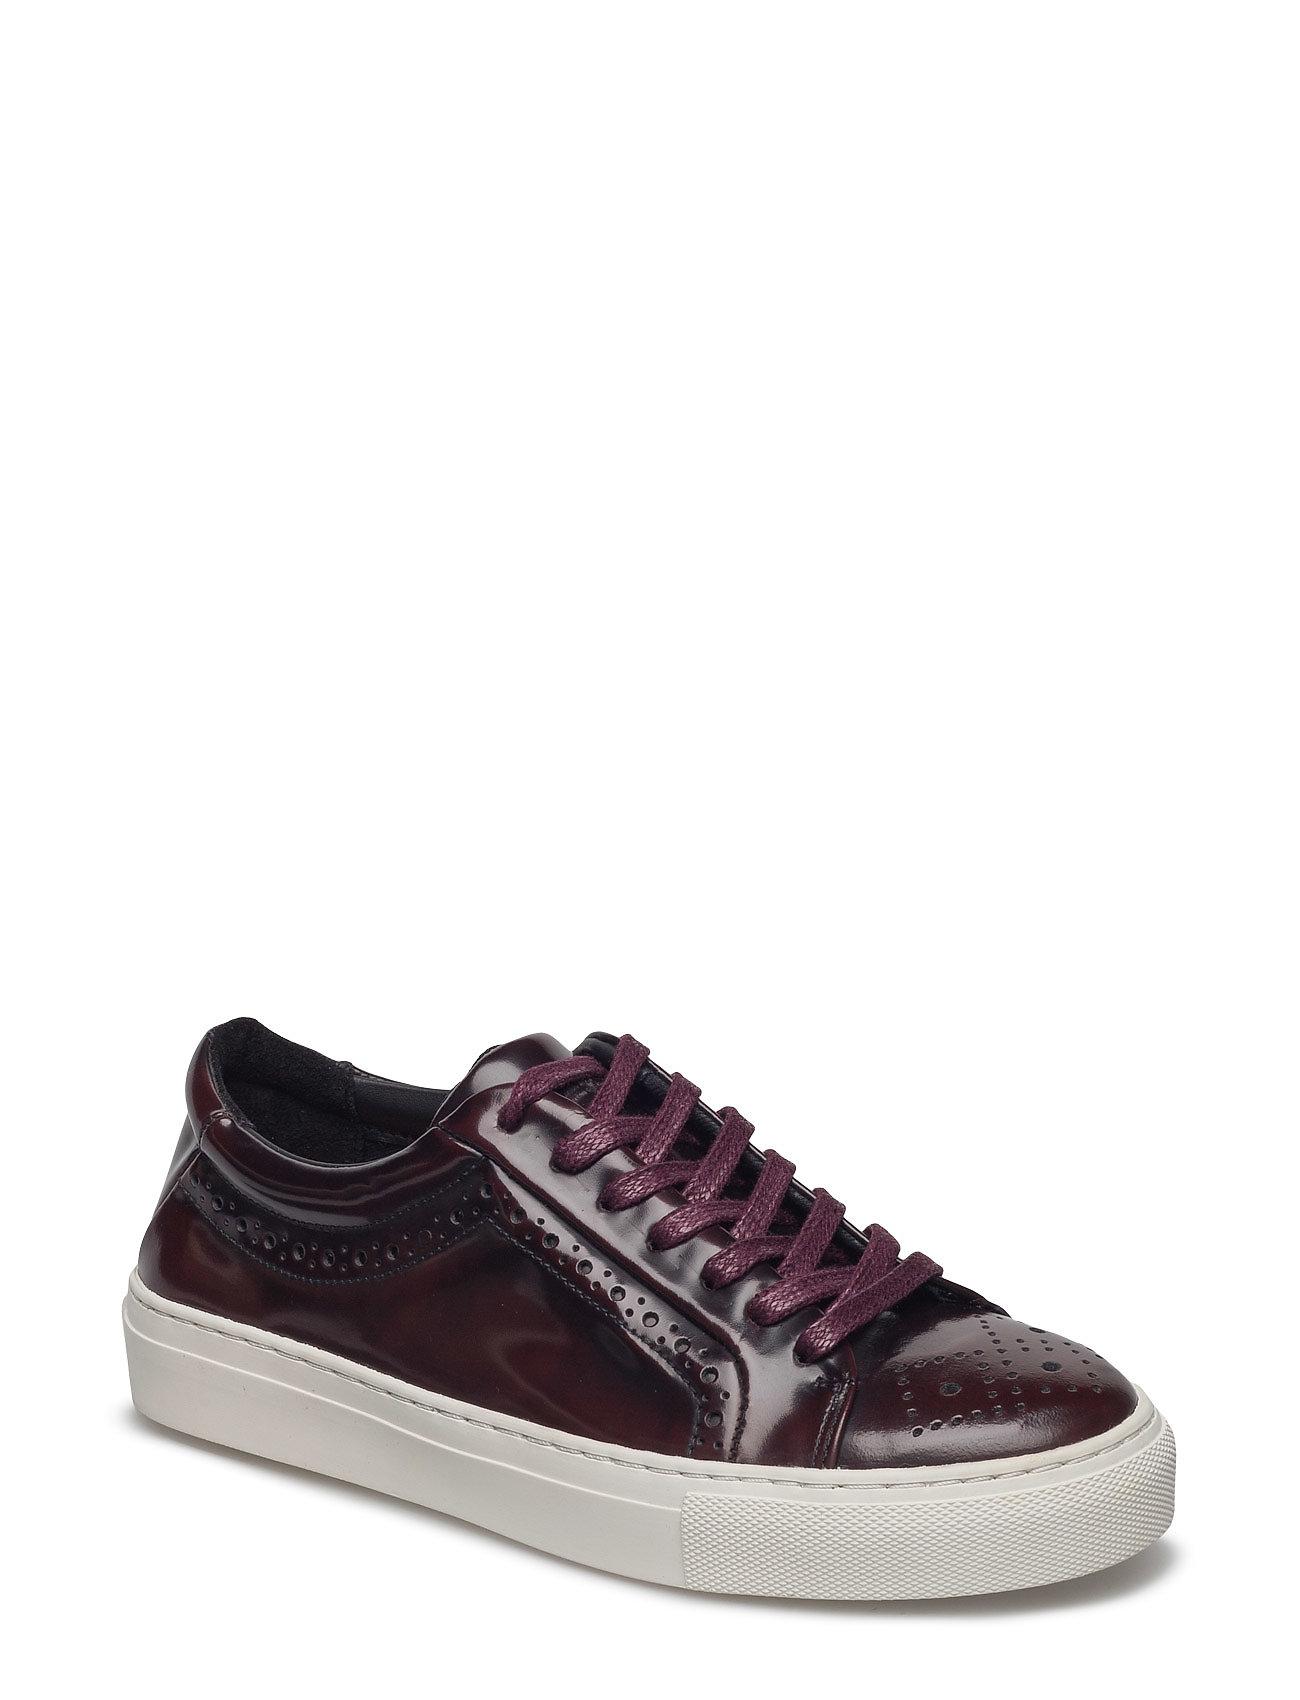 Elpique Brogue Shoe Royal RepubliQ Sneakers til Damer i Bordeaux